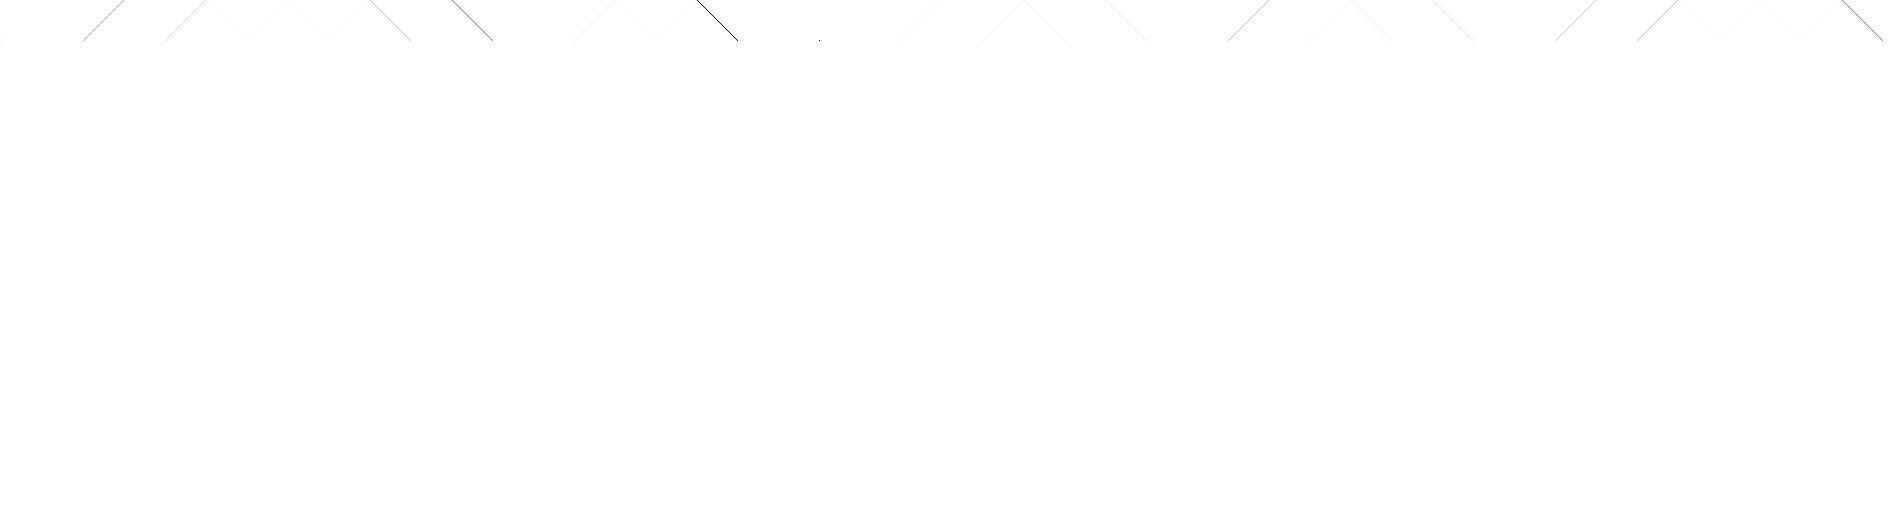 bg branco gradiente corte.png